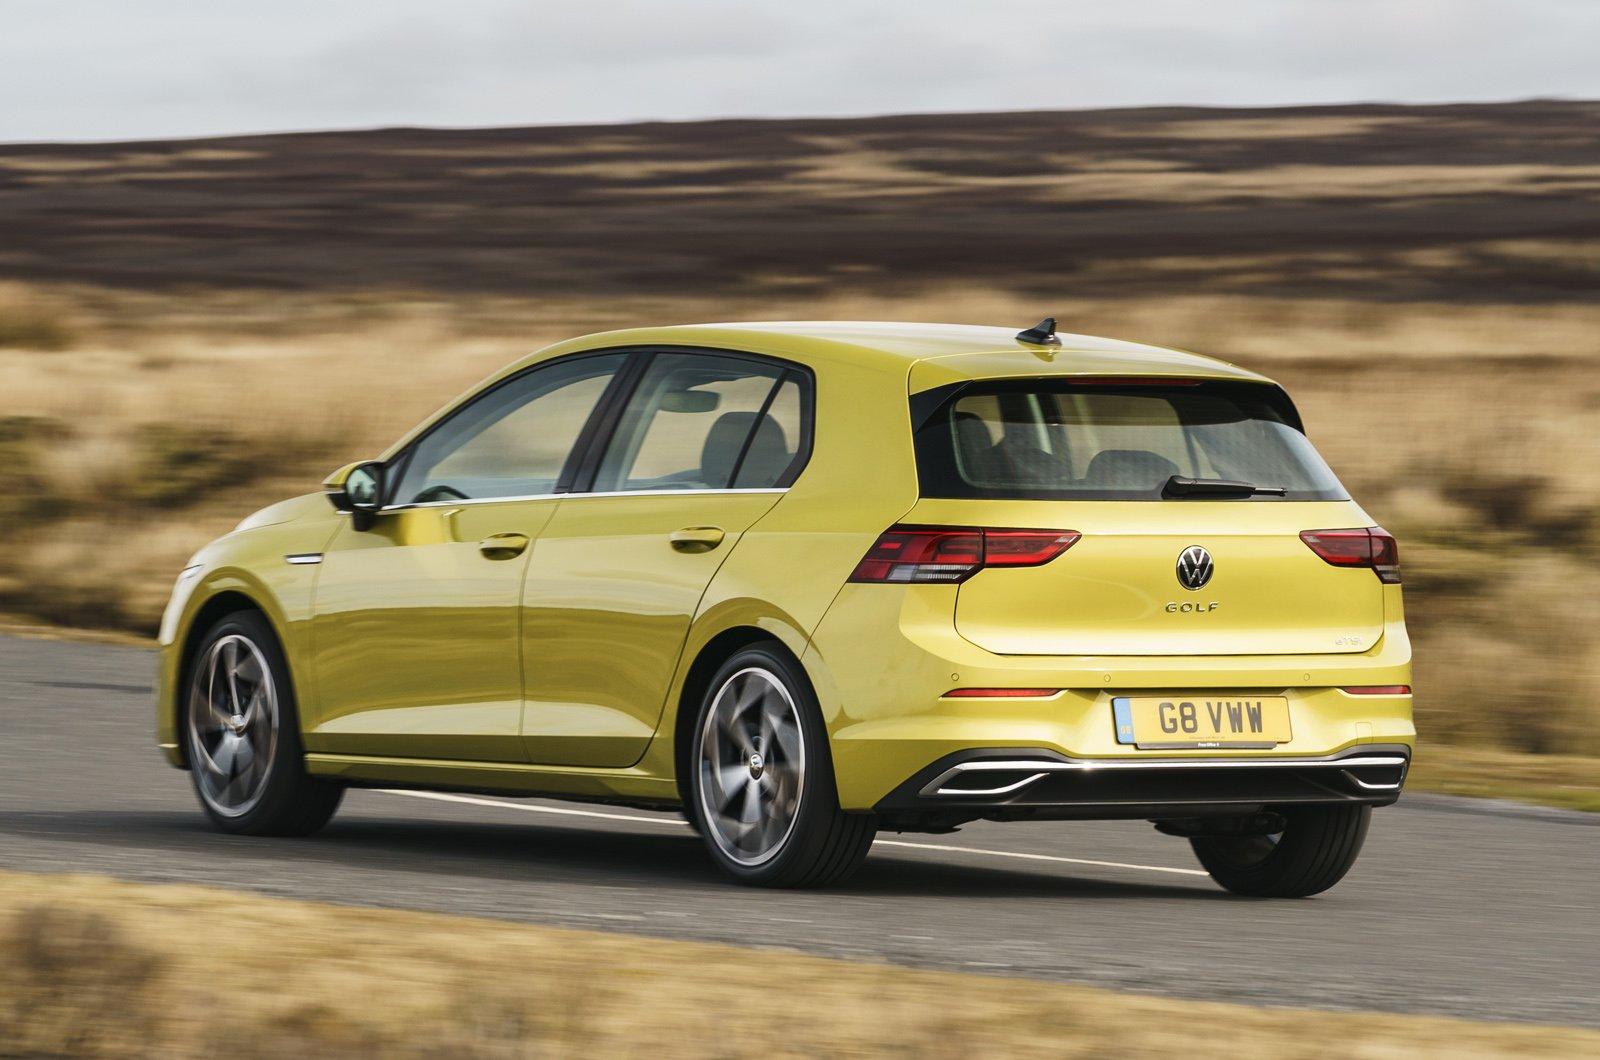 Volkswagen Golf 2021 rear panning